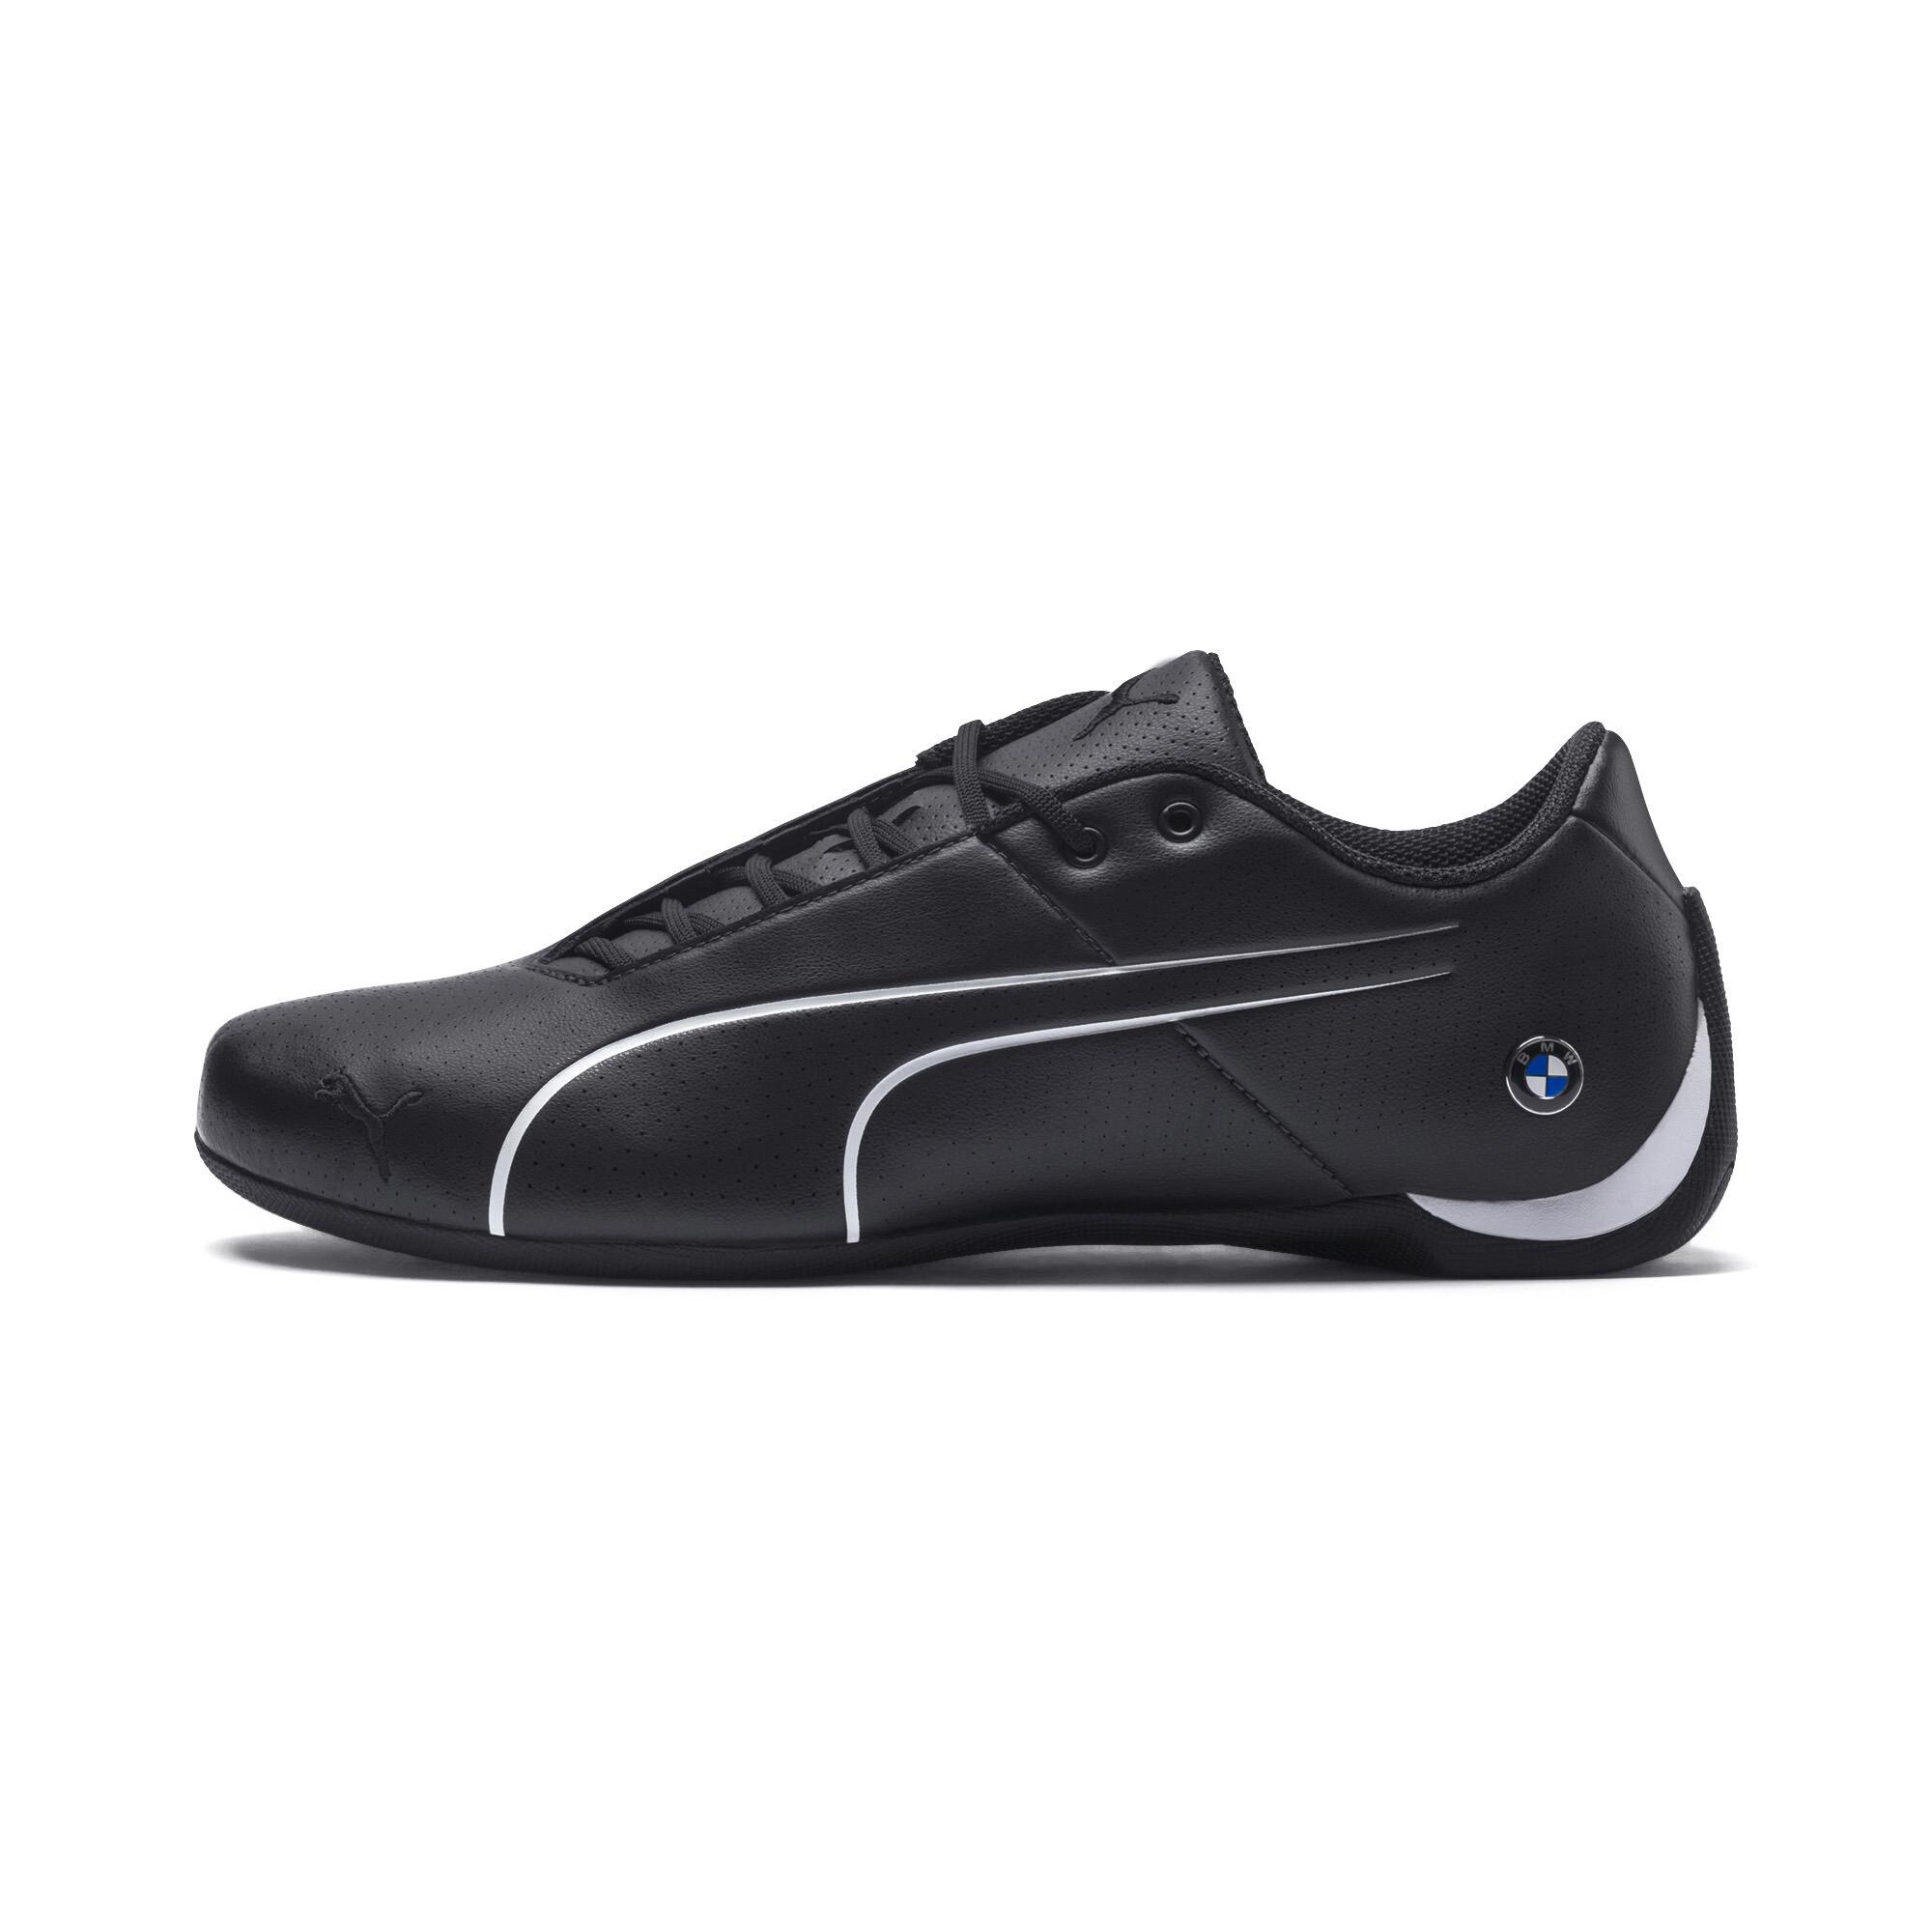 Indexbild 9 - PUMA BMW M Motorsport Future Cat Ultra Sneaker Unisex Schuhe Neu